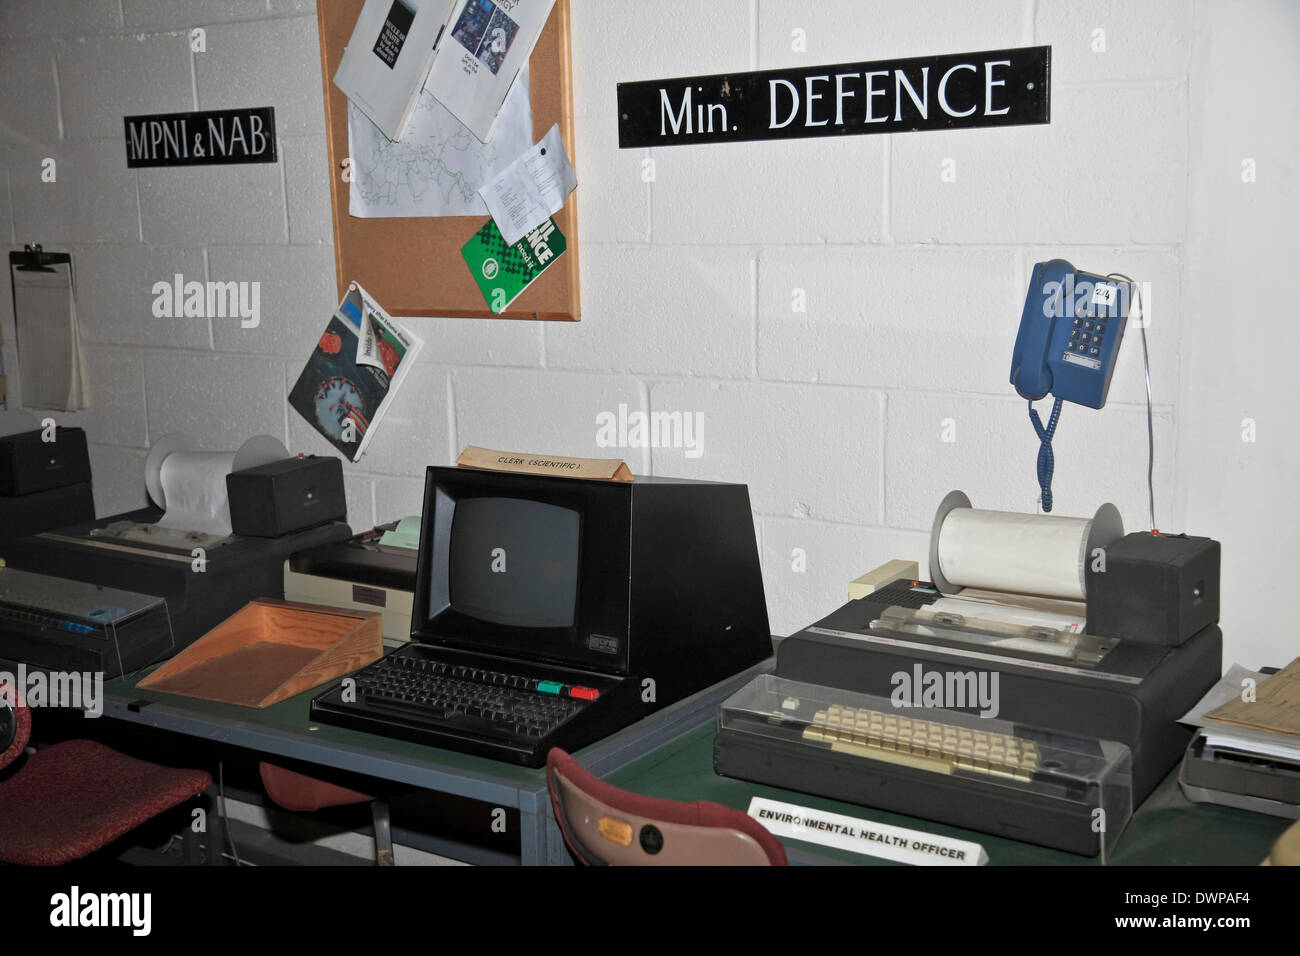 9374. Kelvedon Hatch, Secret Nuclear Bunker, Brentwood, Essex, England - Stock Image